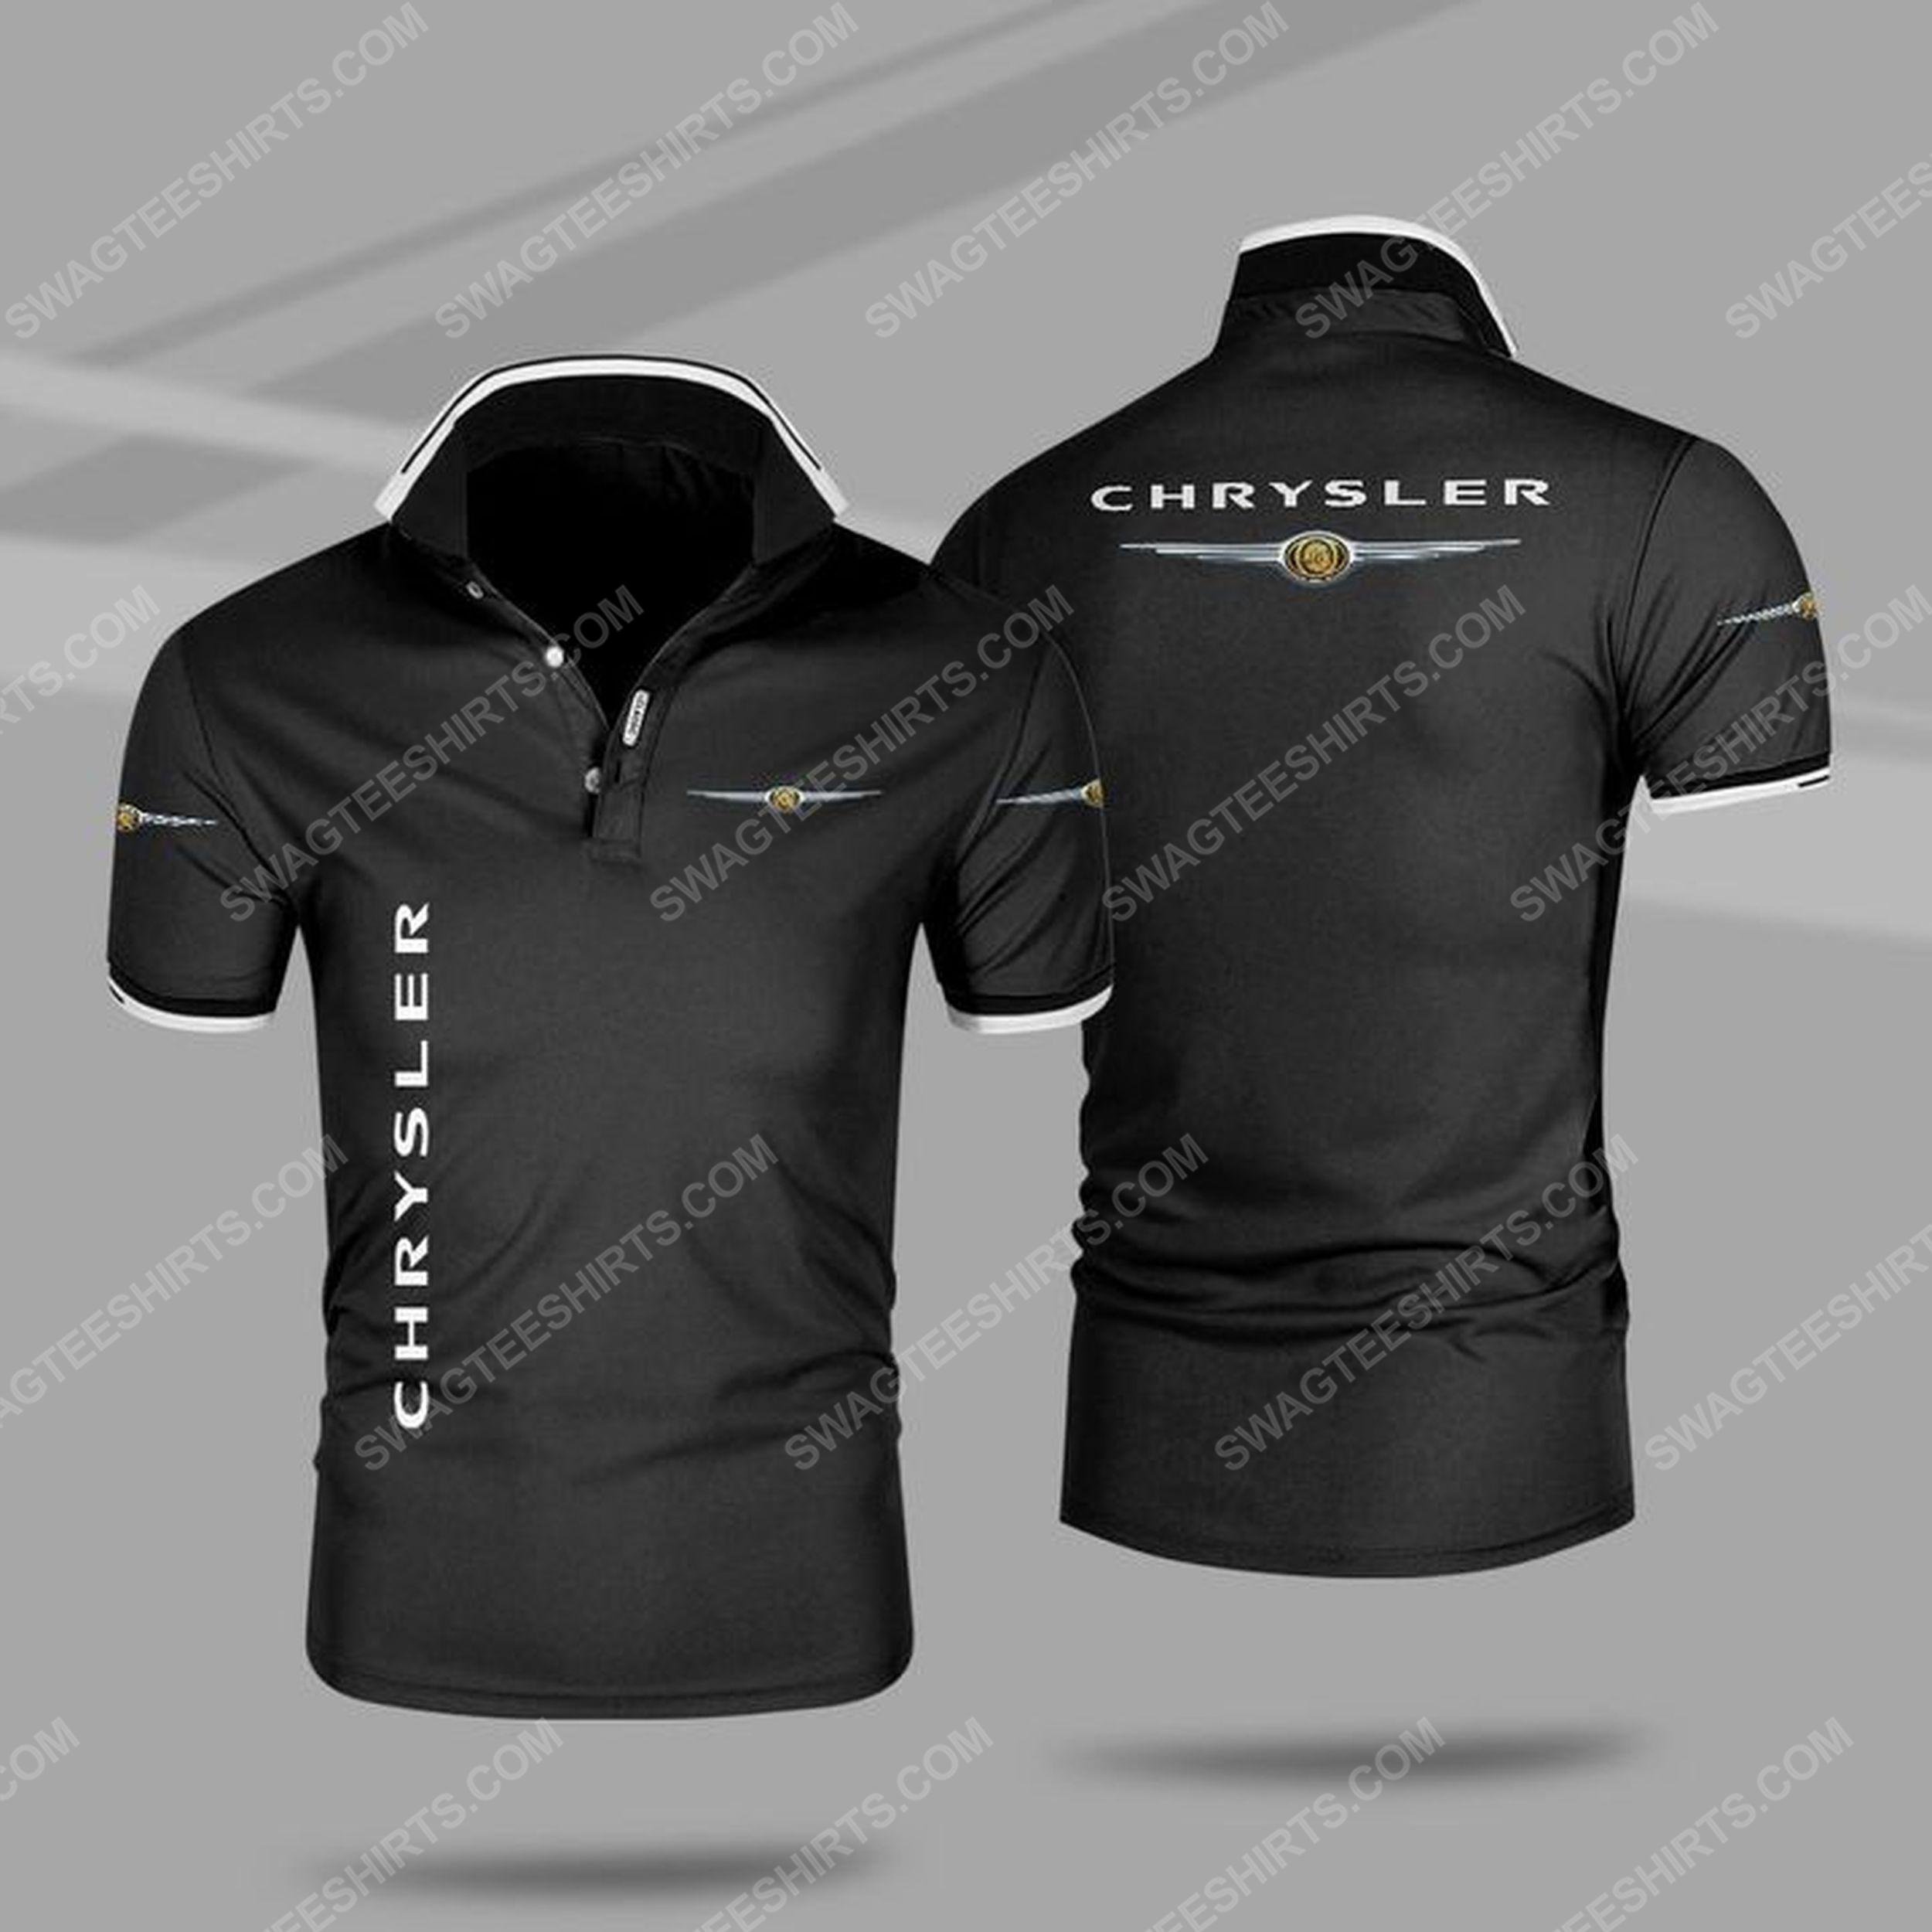 The chrysler car symbol all over print polo shirt - black 1